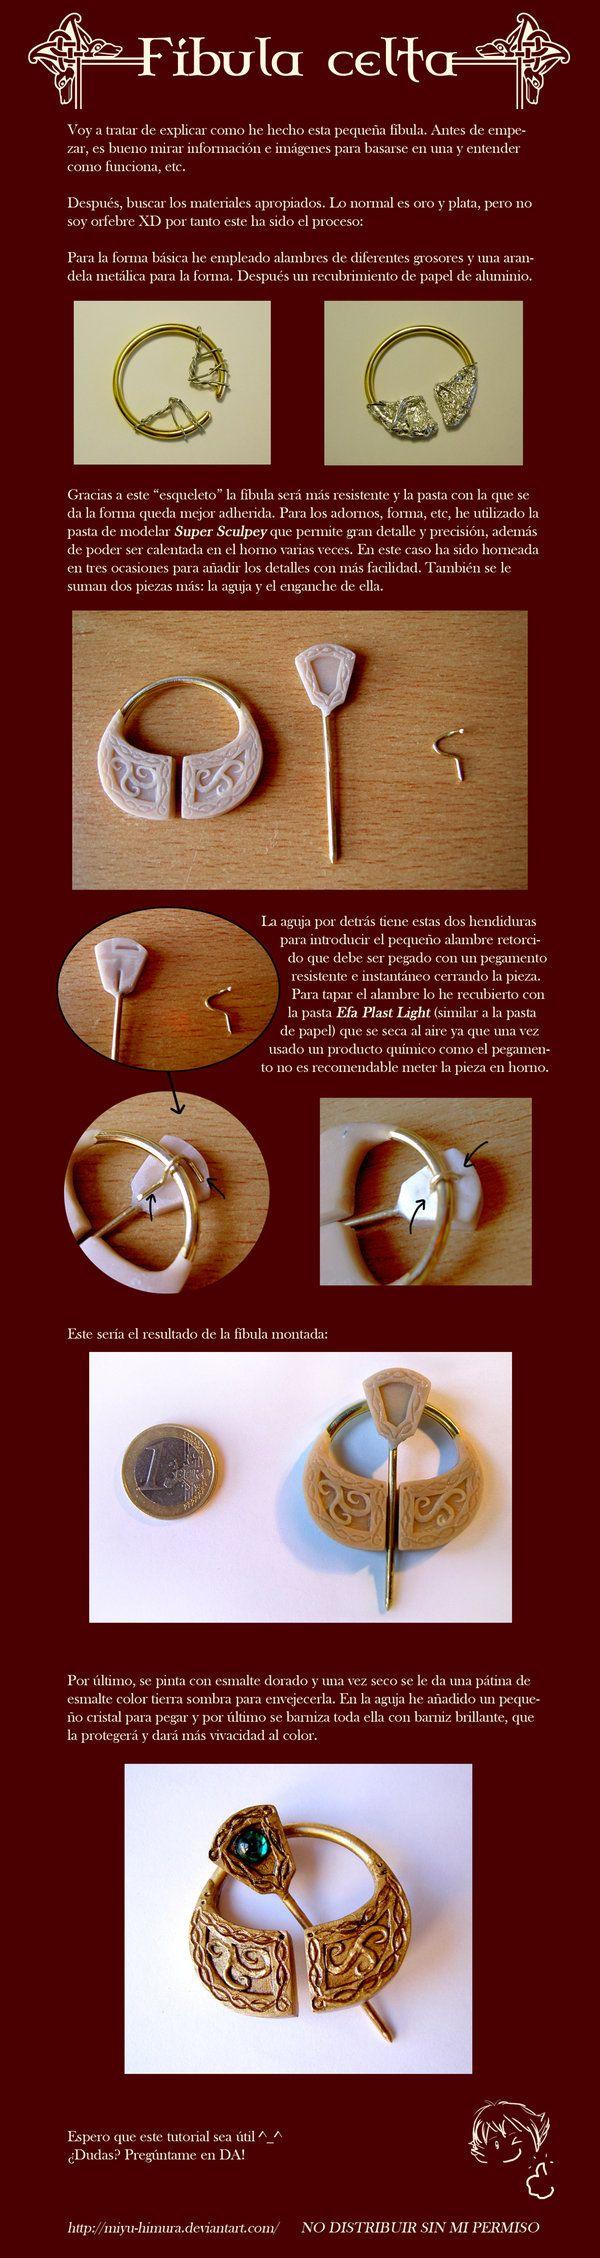 http://tierracelta.blogspot.com.es/search/label/tutorial